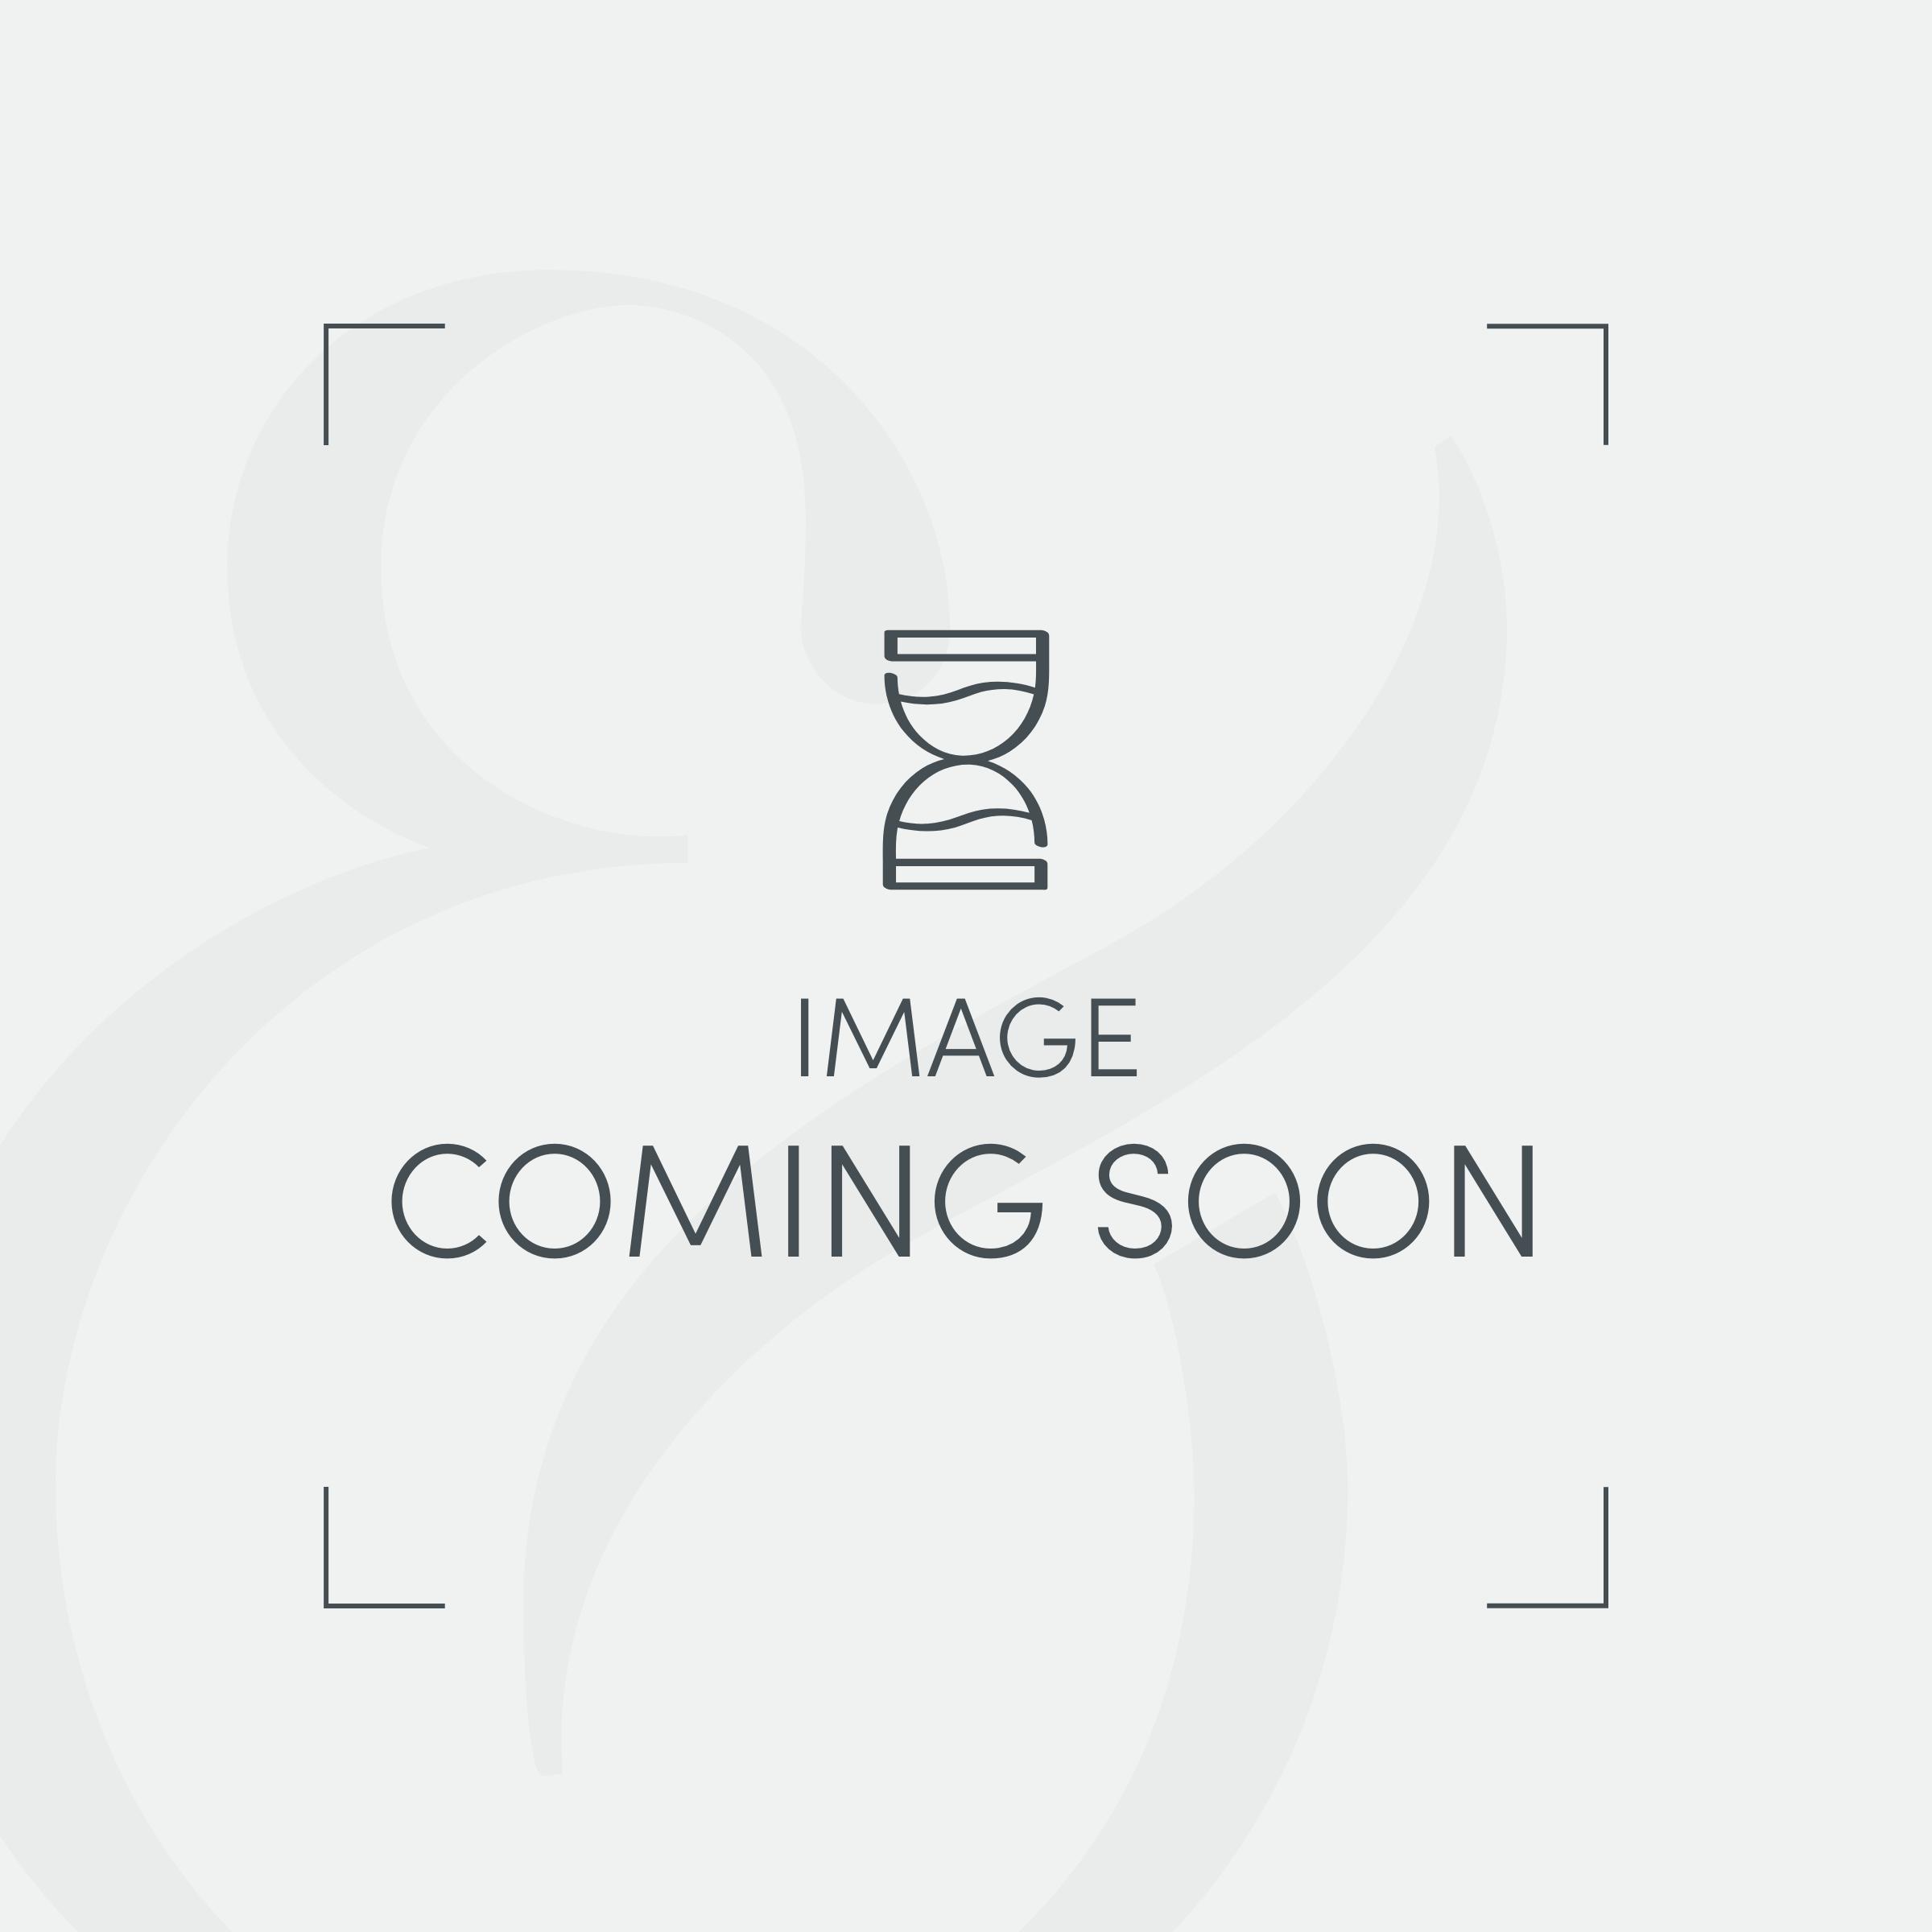 Luxury Cashmere 4000 Pocket Air Spring Pillow Top Superking Mattress - Medium